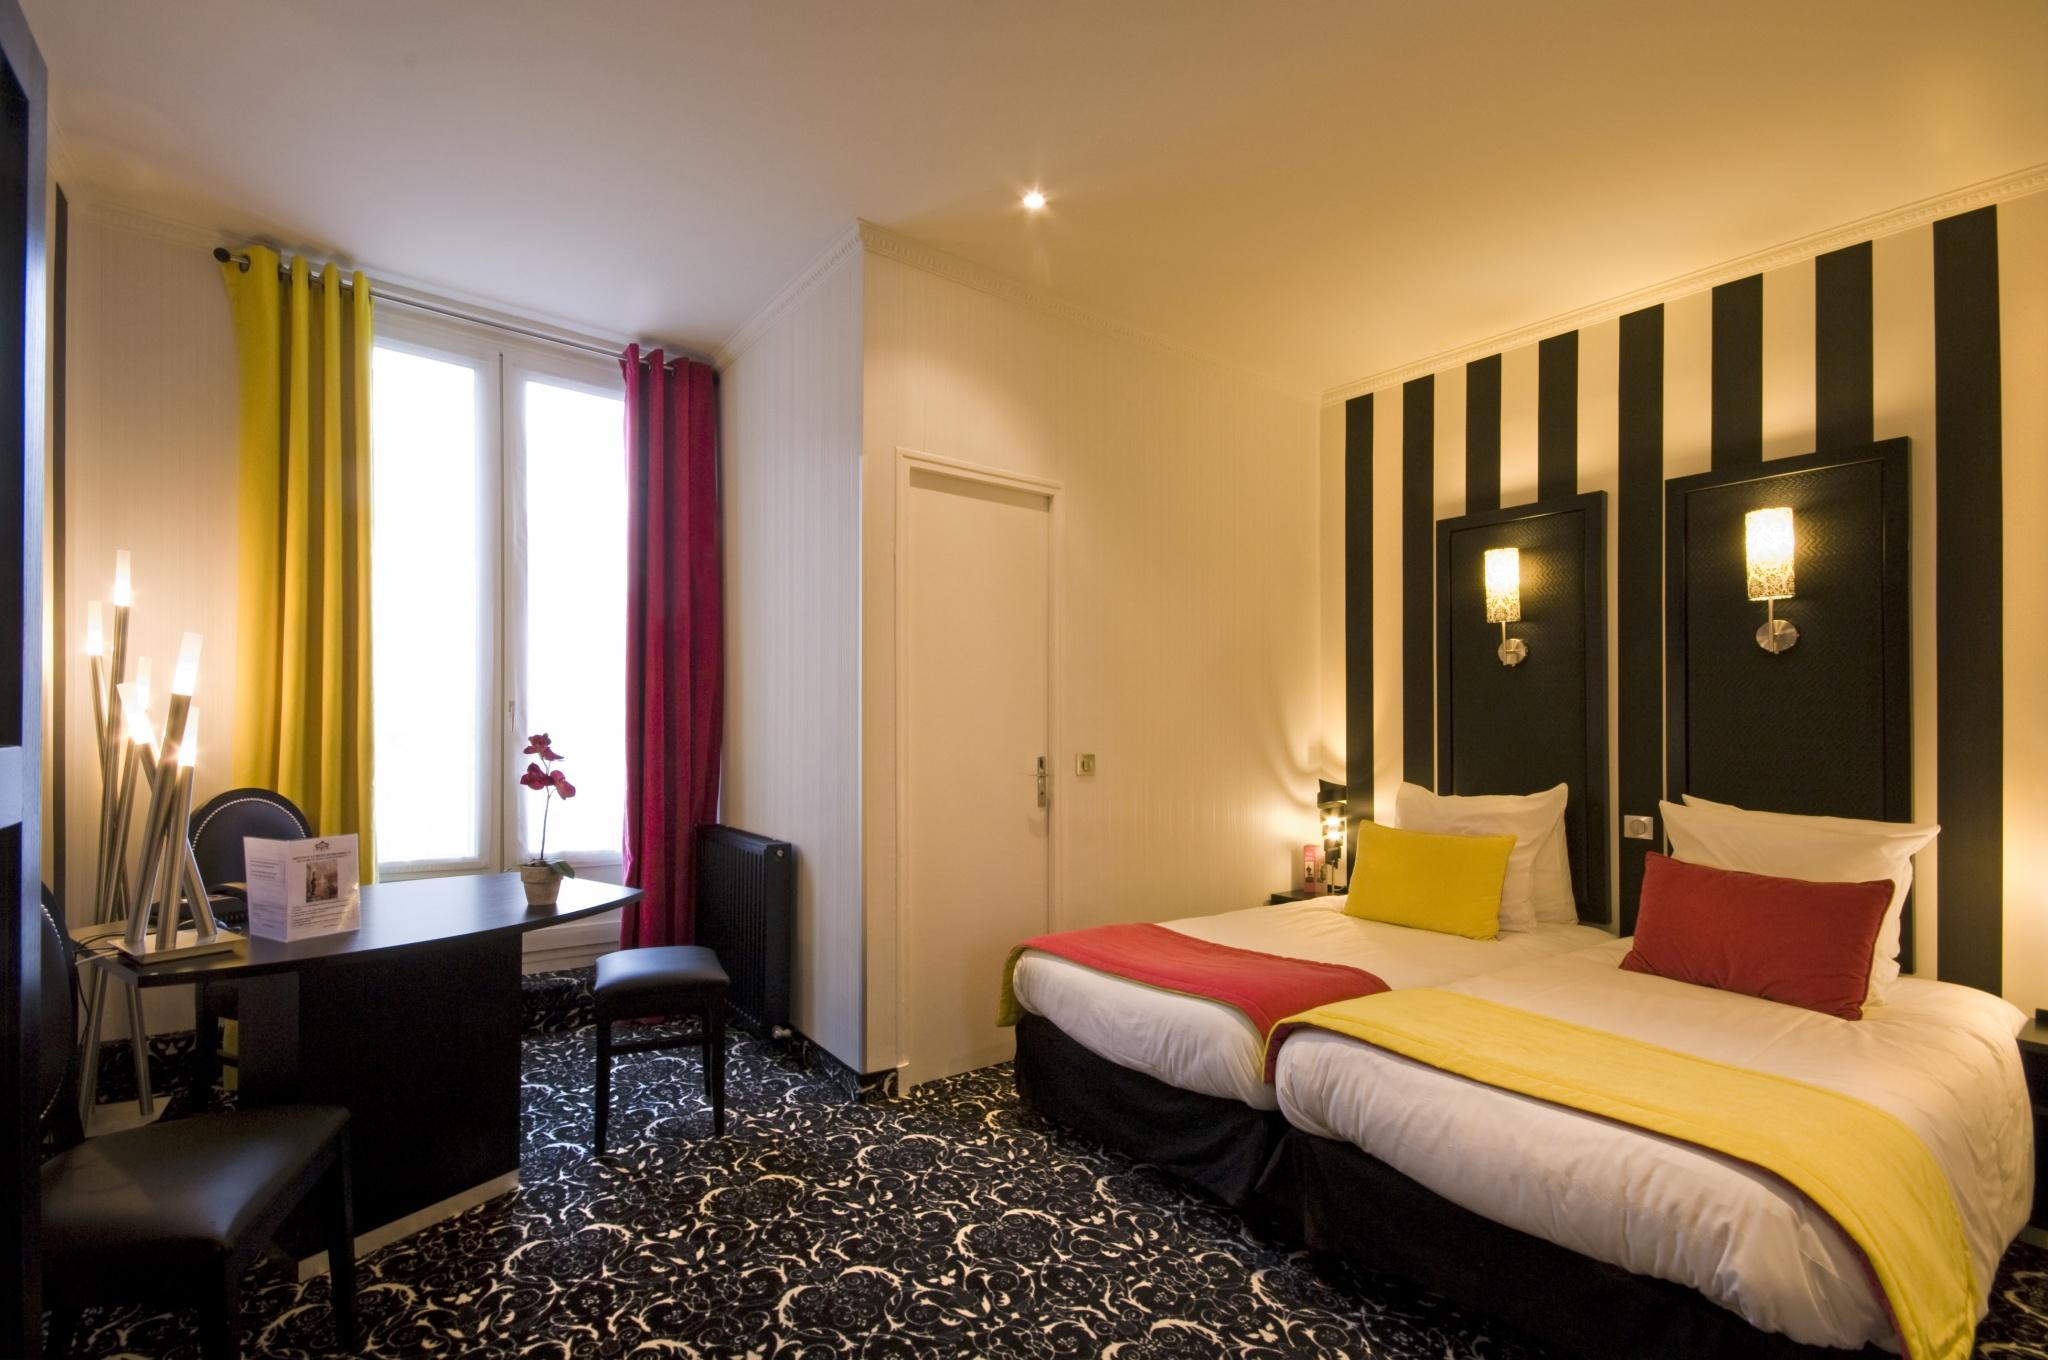 CHAMBRE DOUBLE OU TWIN SUPÉRIEURE 18 m² en moyenne | Hôtel ...